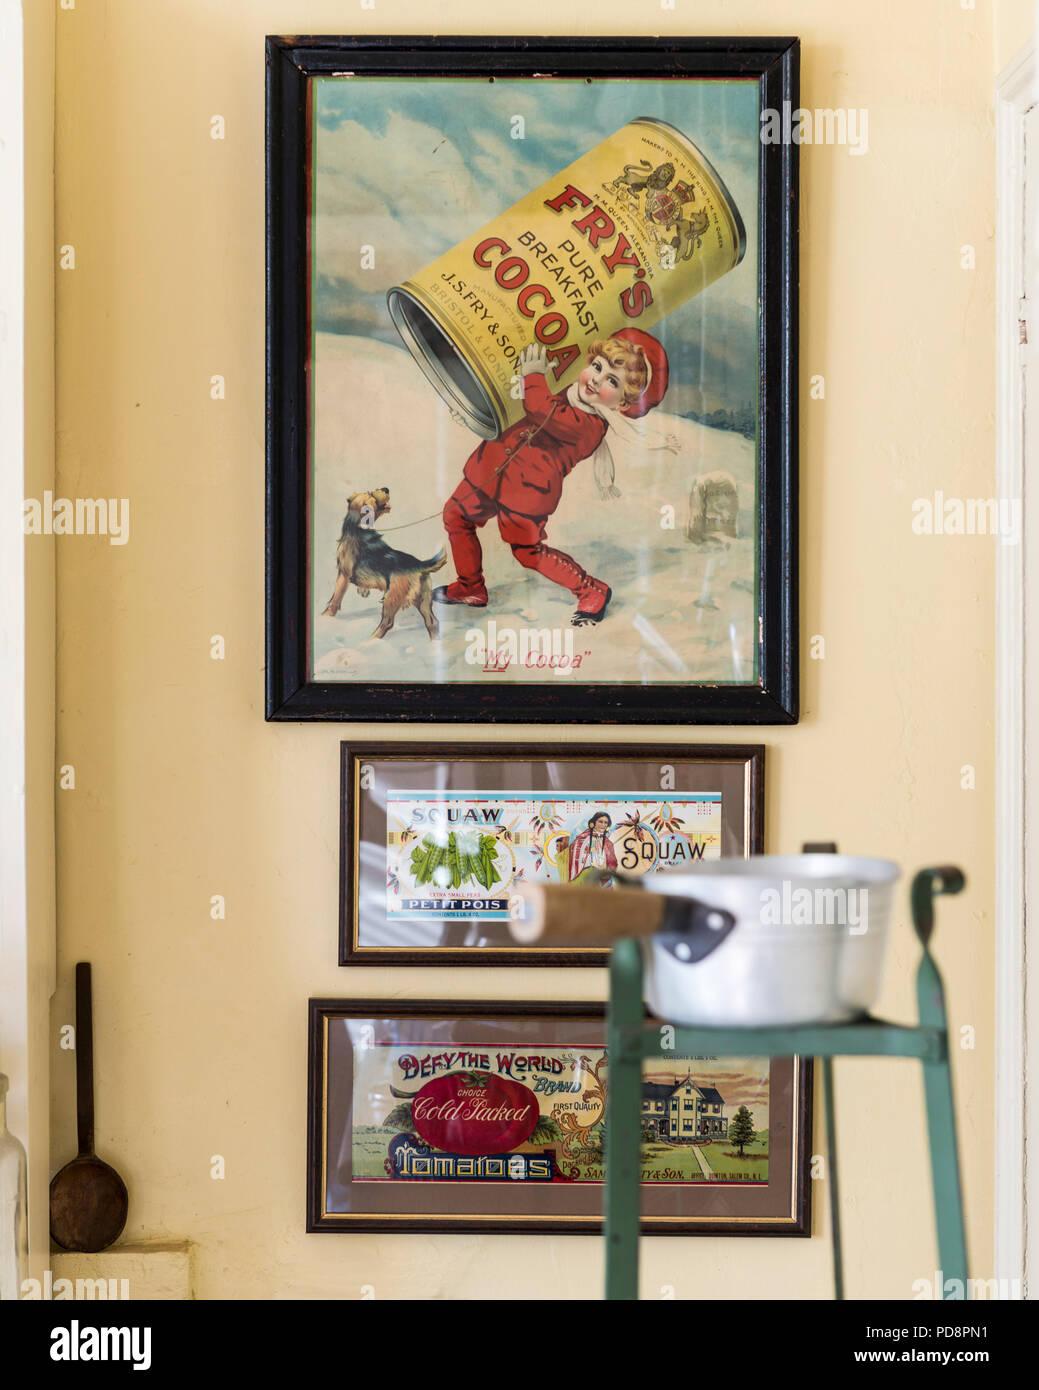 Three framed vintage food posters - Stock Image